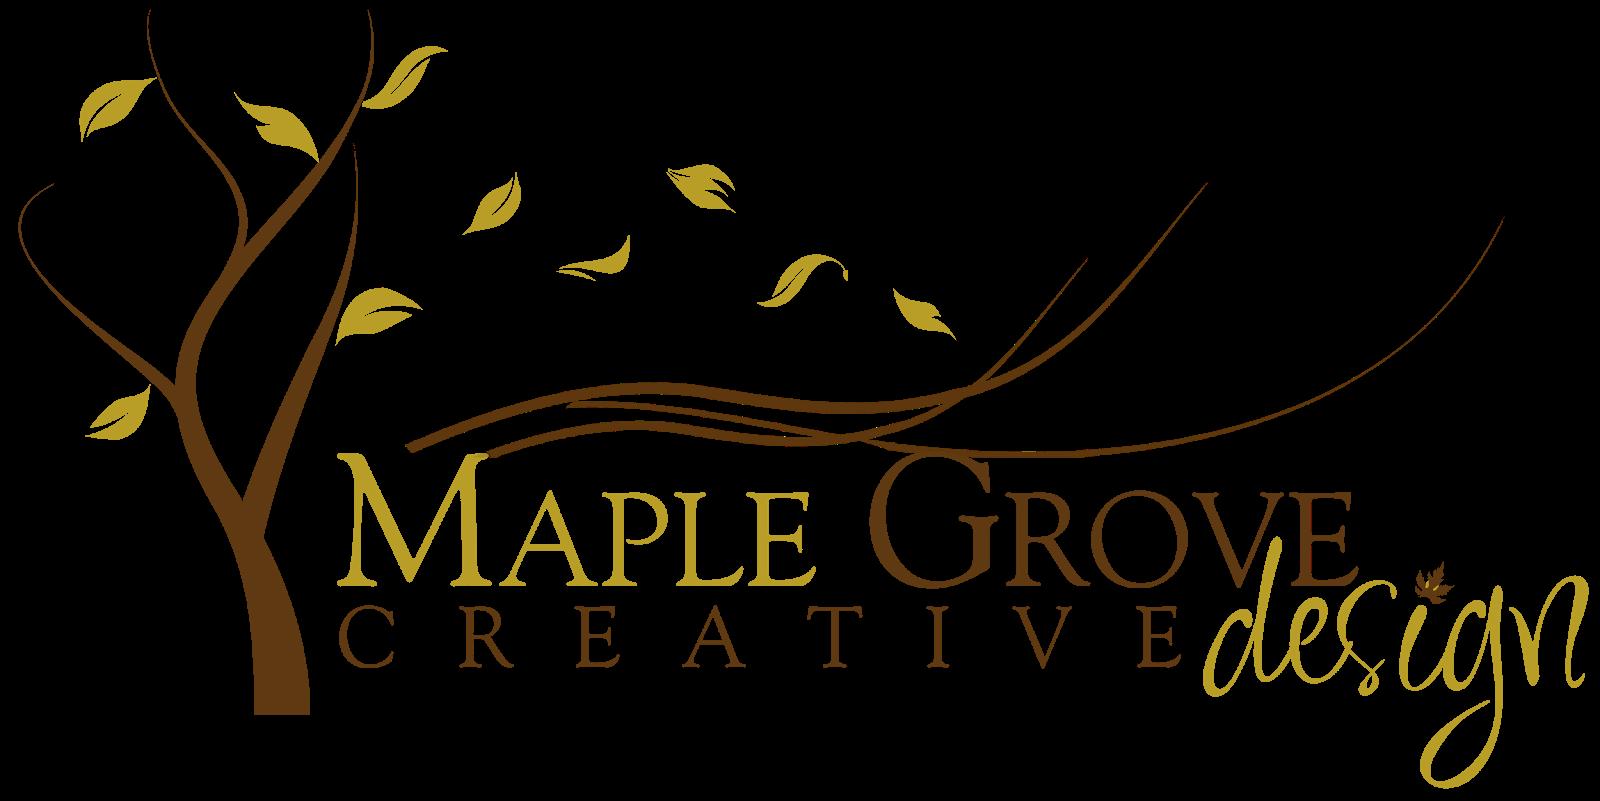 Maple Grove Creative Design